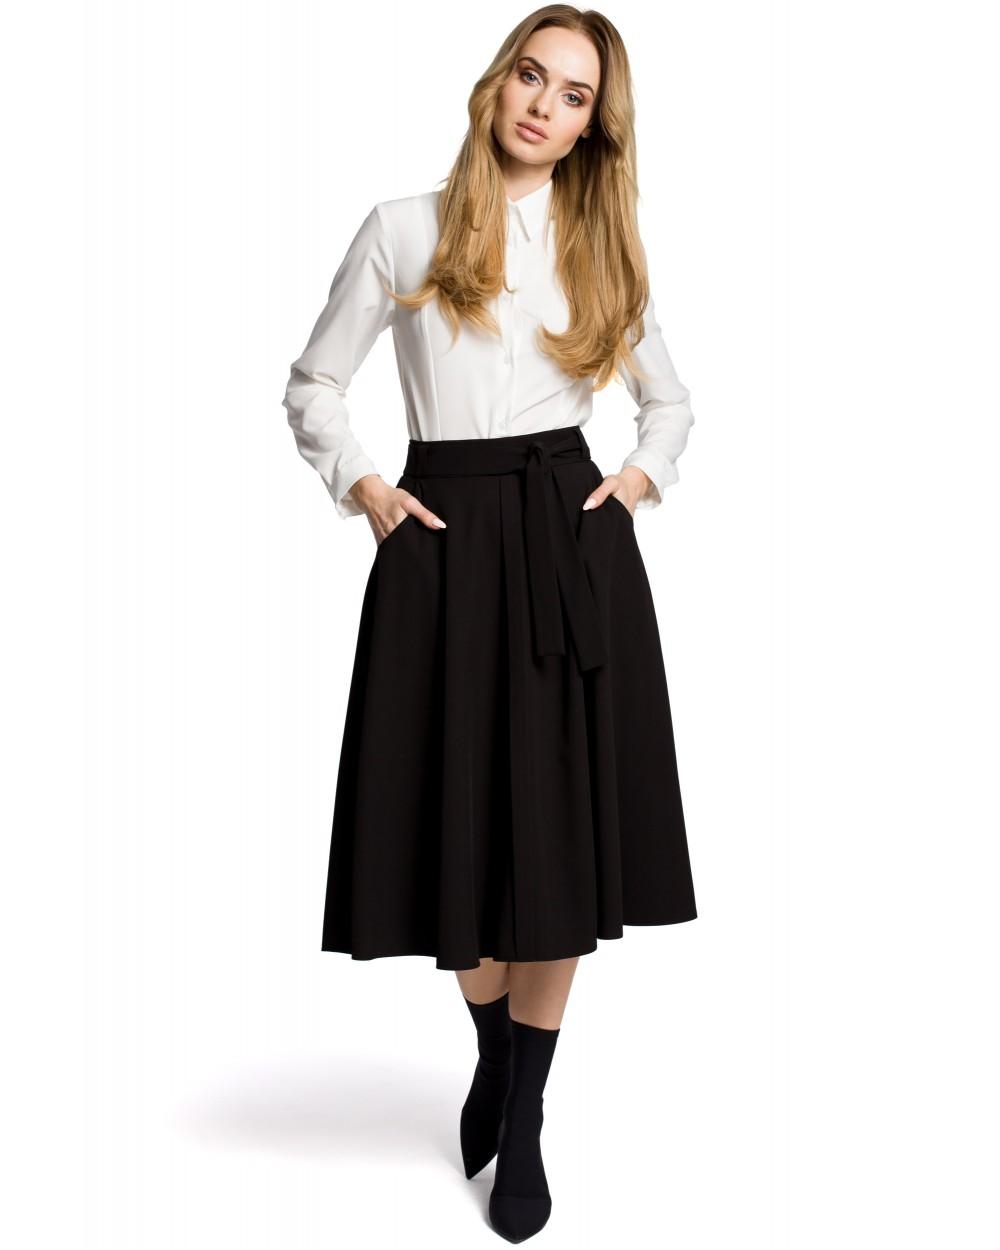 fc22c224 Damska spódnica o rozkloszowany kroju